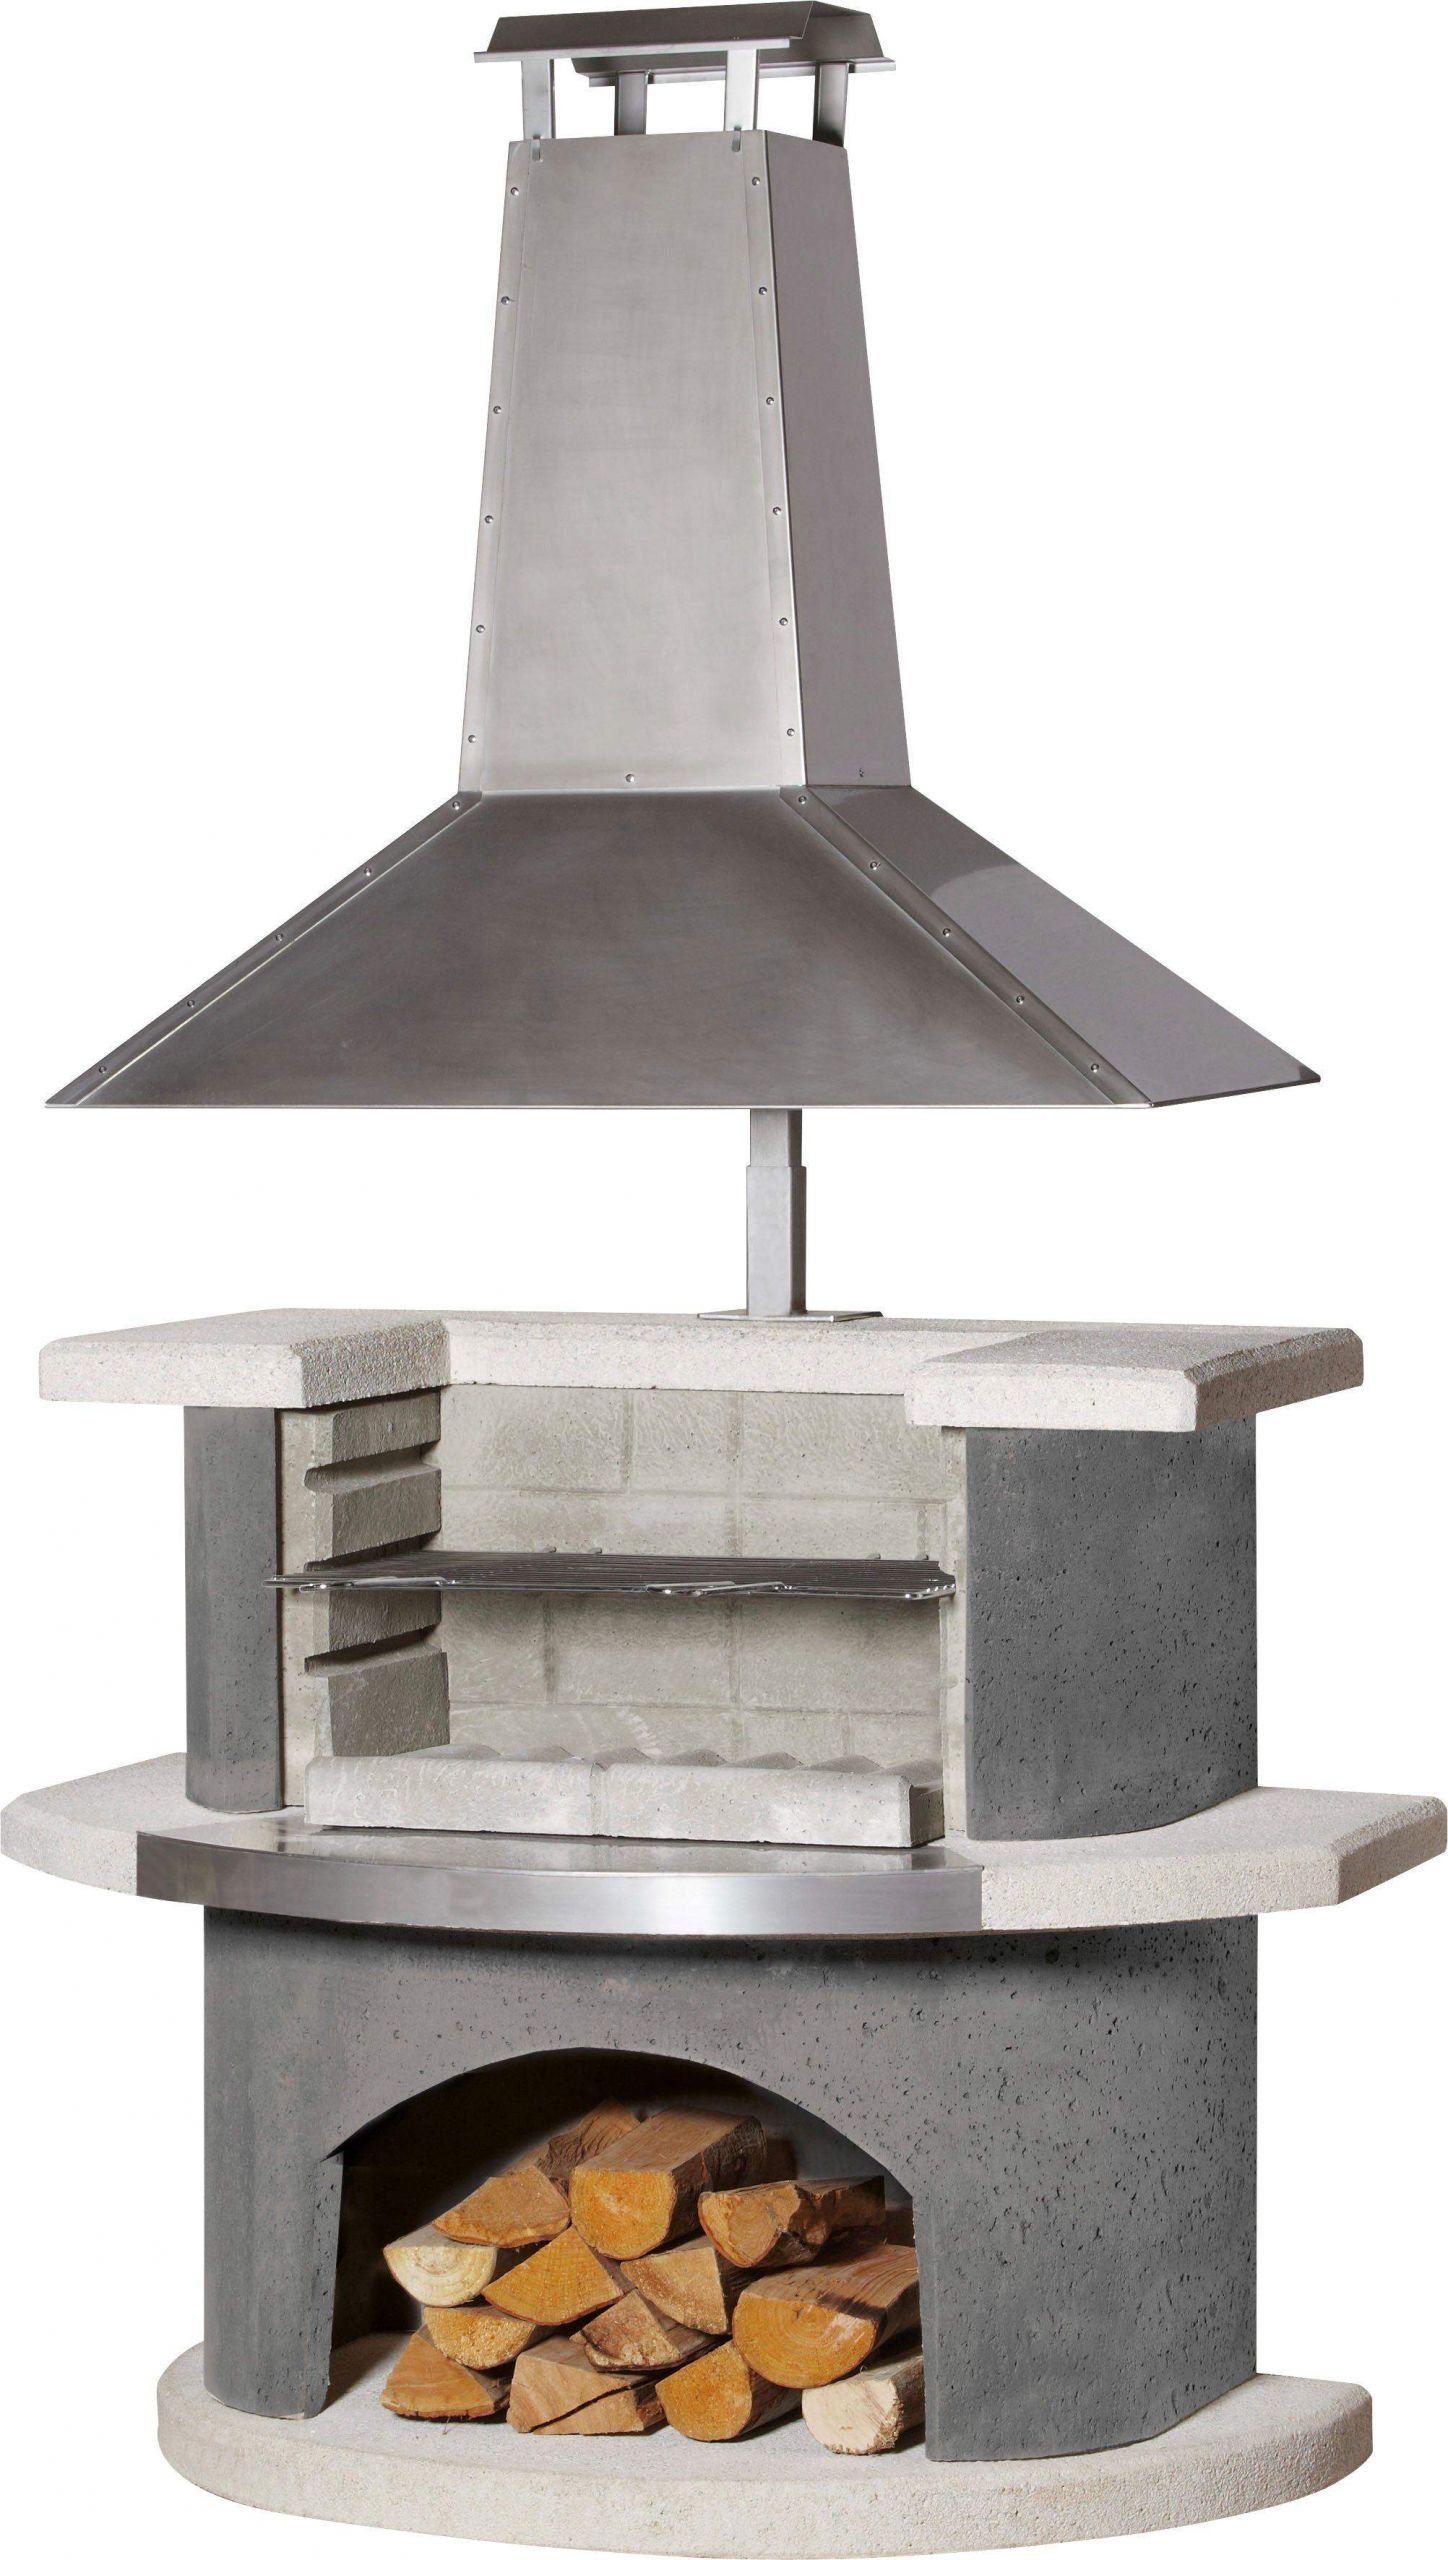 buschbeck grillkamin zuerich b t h 110 65 210 cm